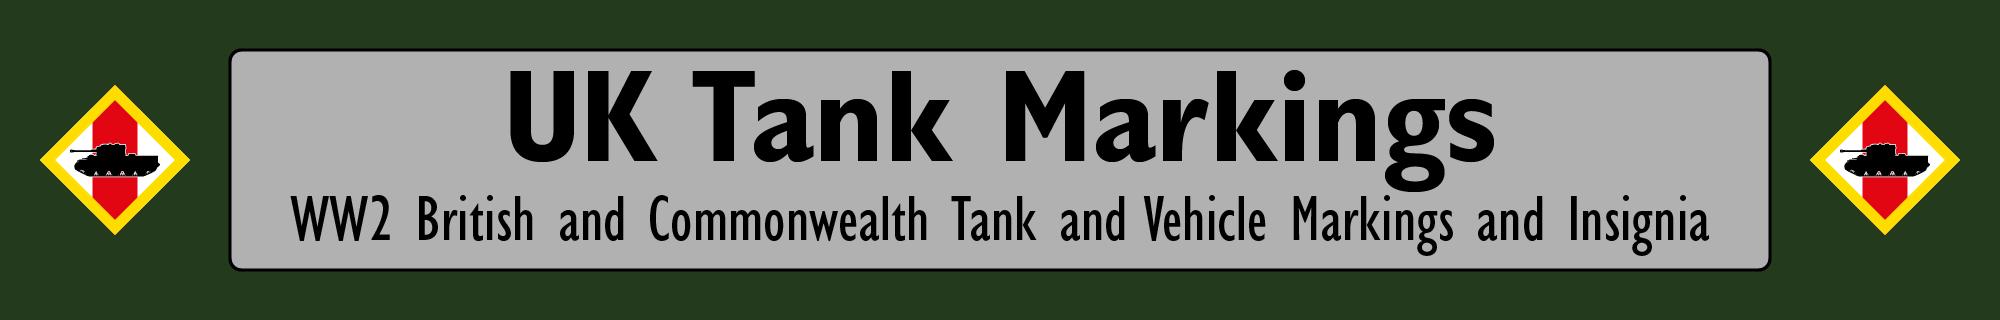 UK Tank Markings